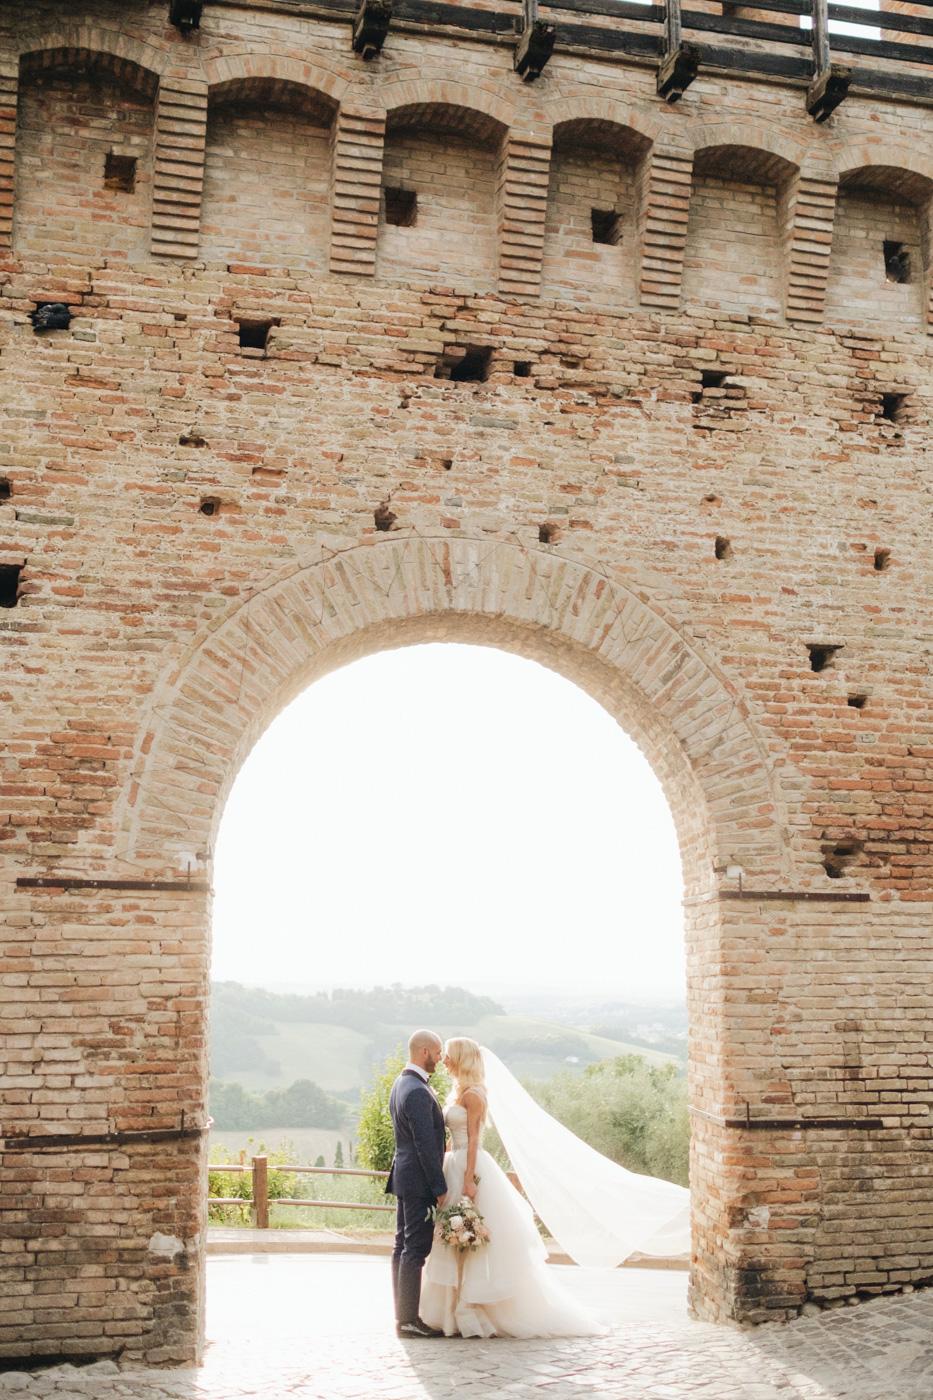 Matrimoni all'italiana wedding photographer italy-117.jpg